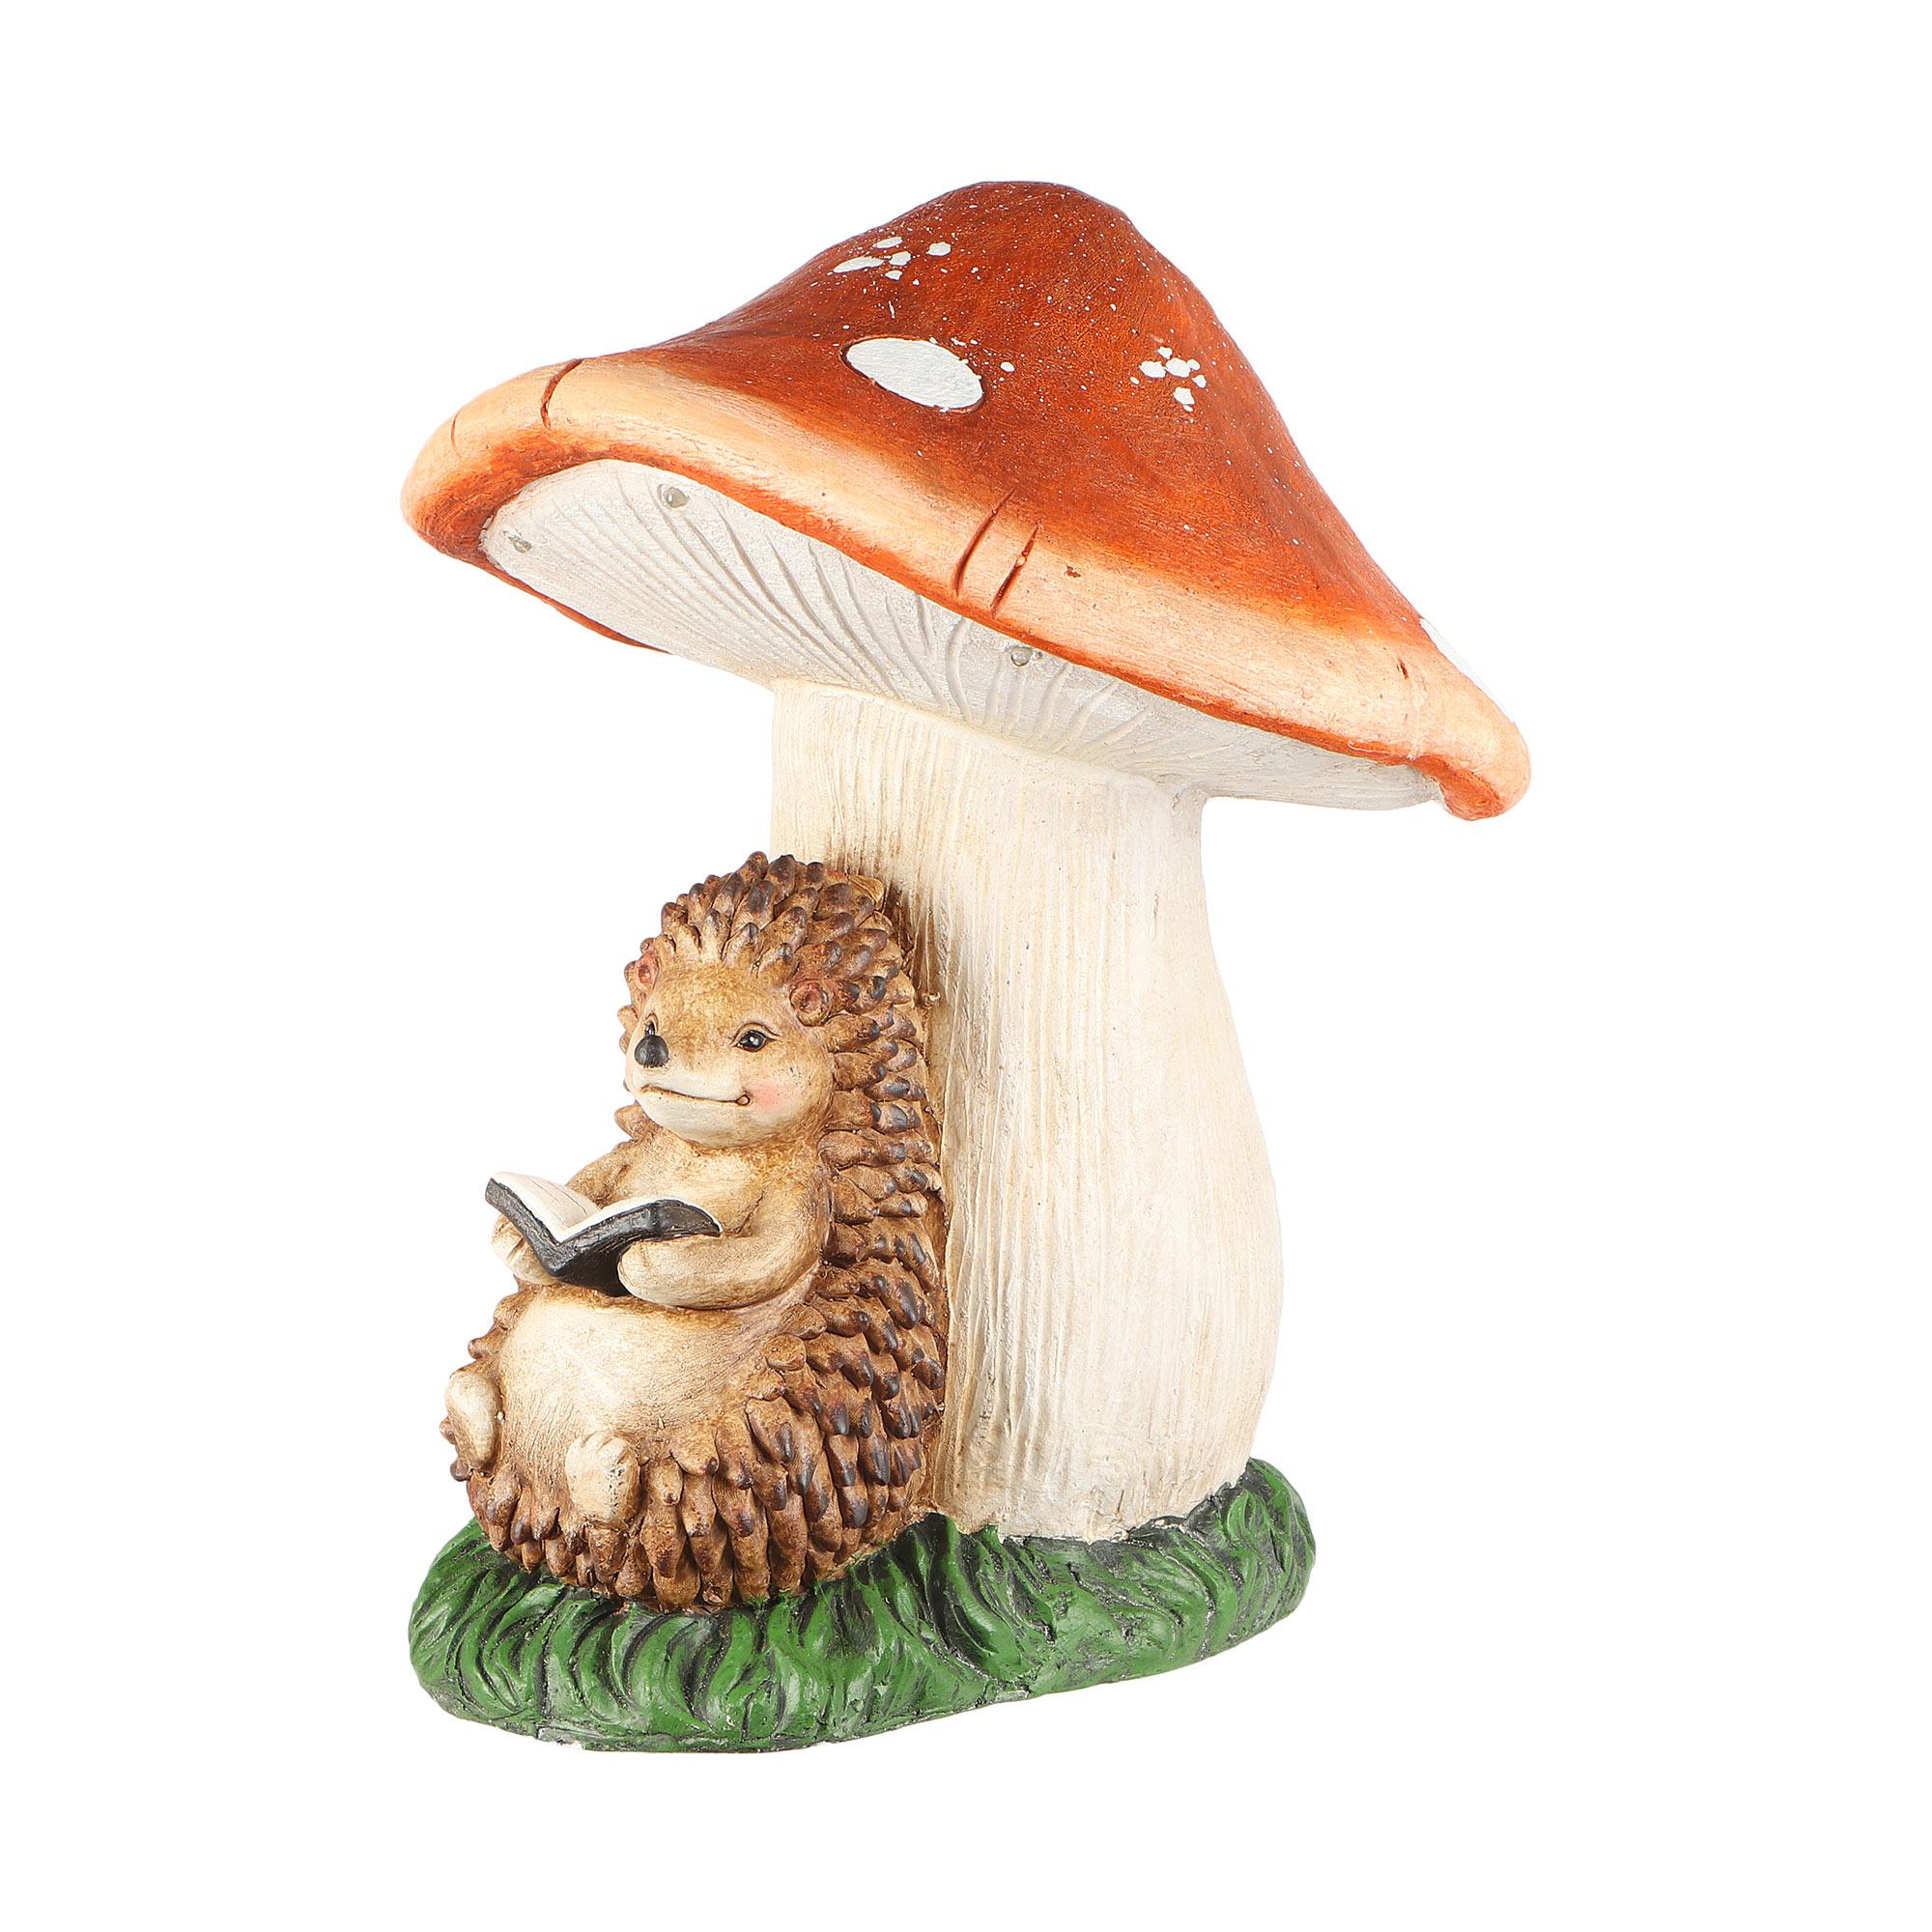 Фото - Фигура садовая Foryoucraft еж под грибом 30.5х30х36.3см фигура садовая гусеница 30х15х14см